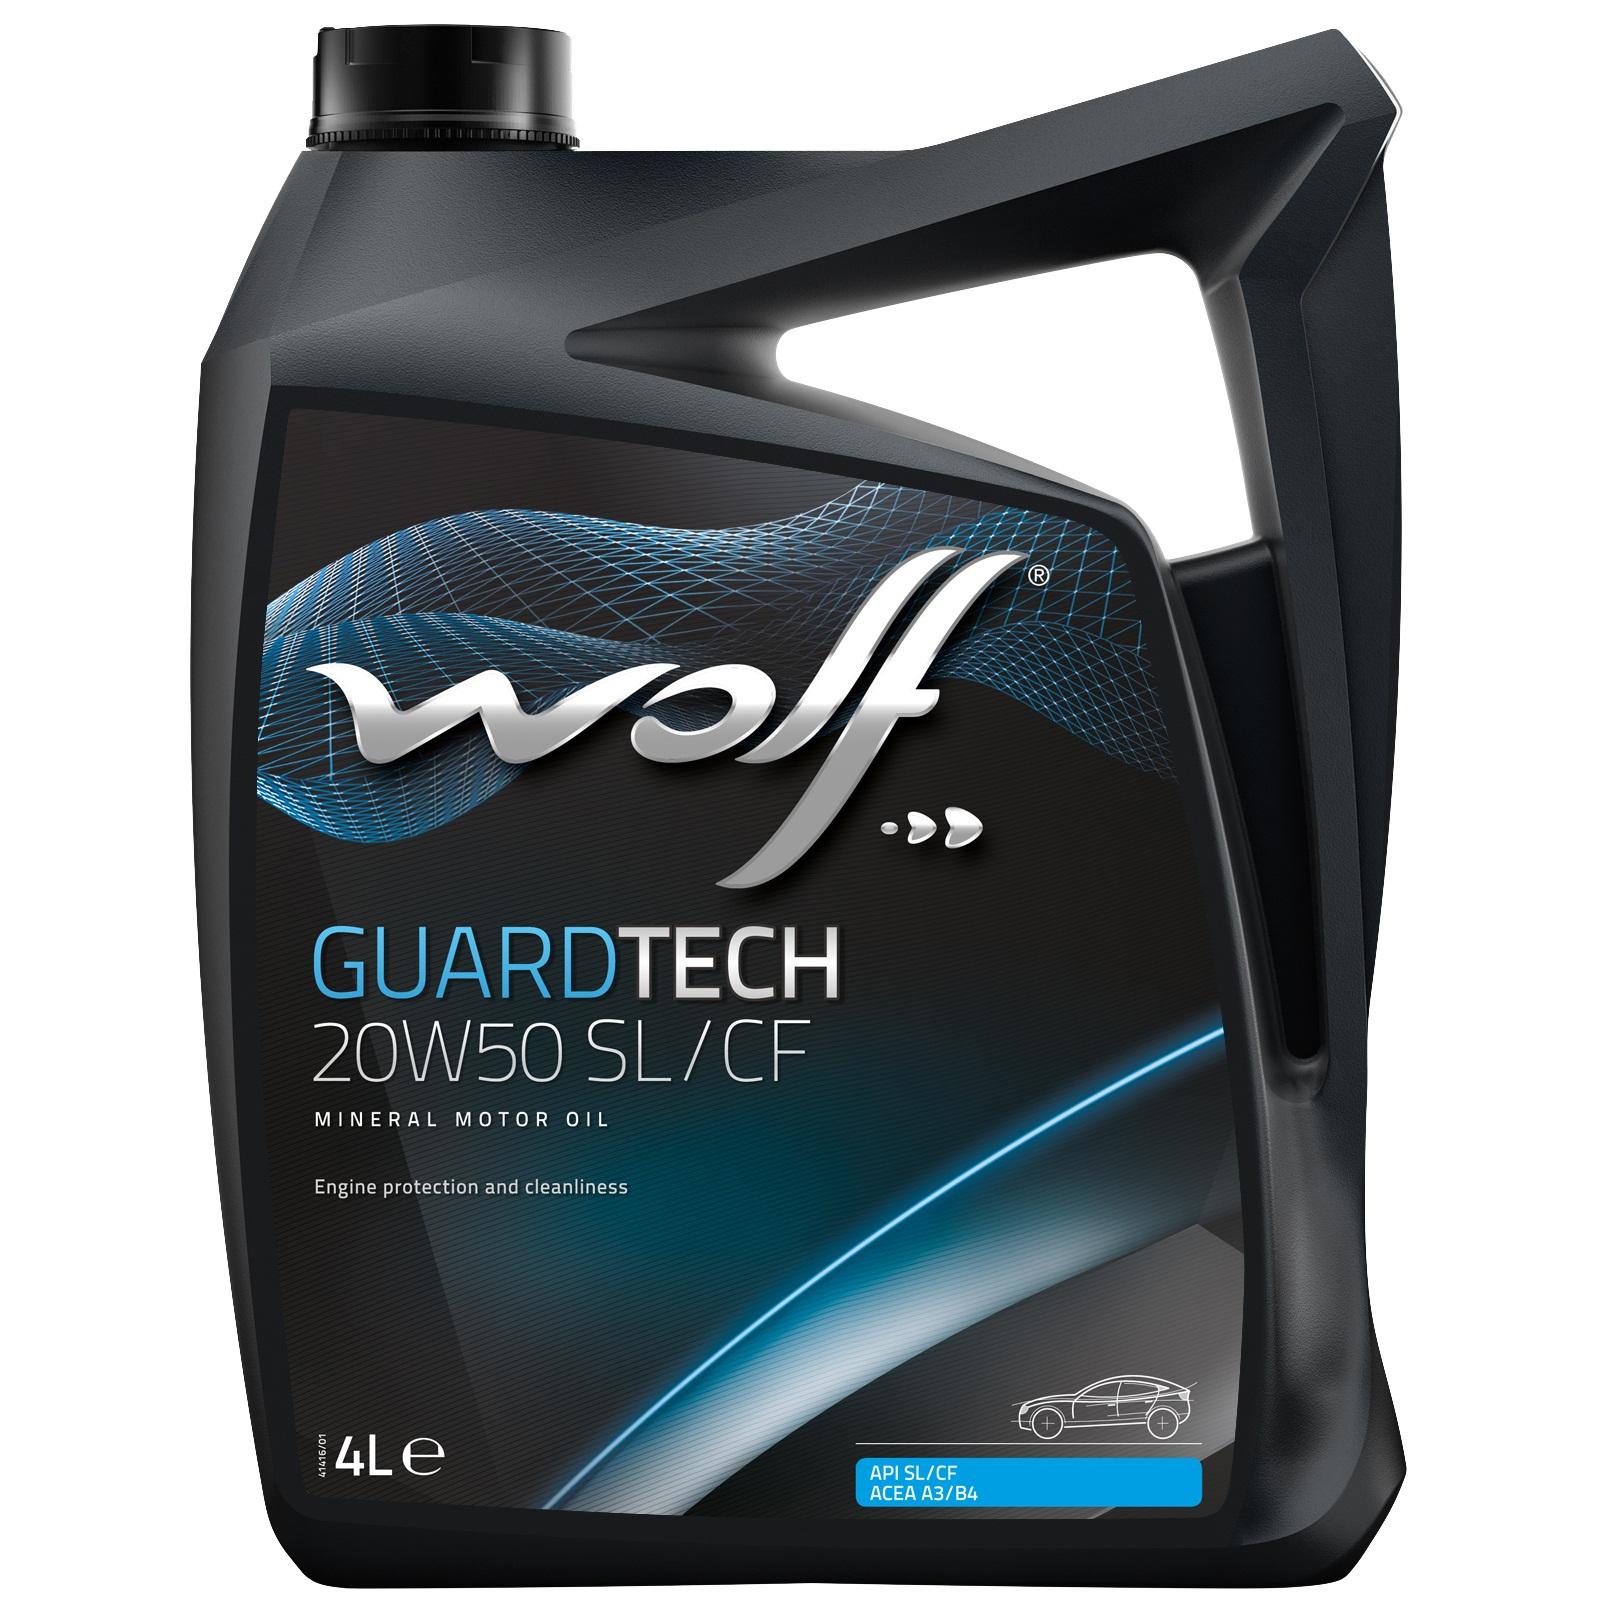 ULEI MOTOR WOLF GUARDTECH SL/CF 20W50 4L